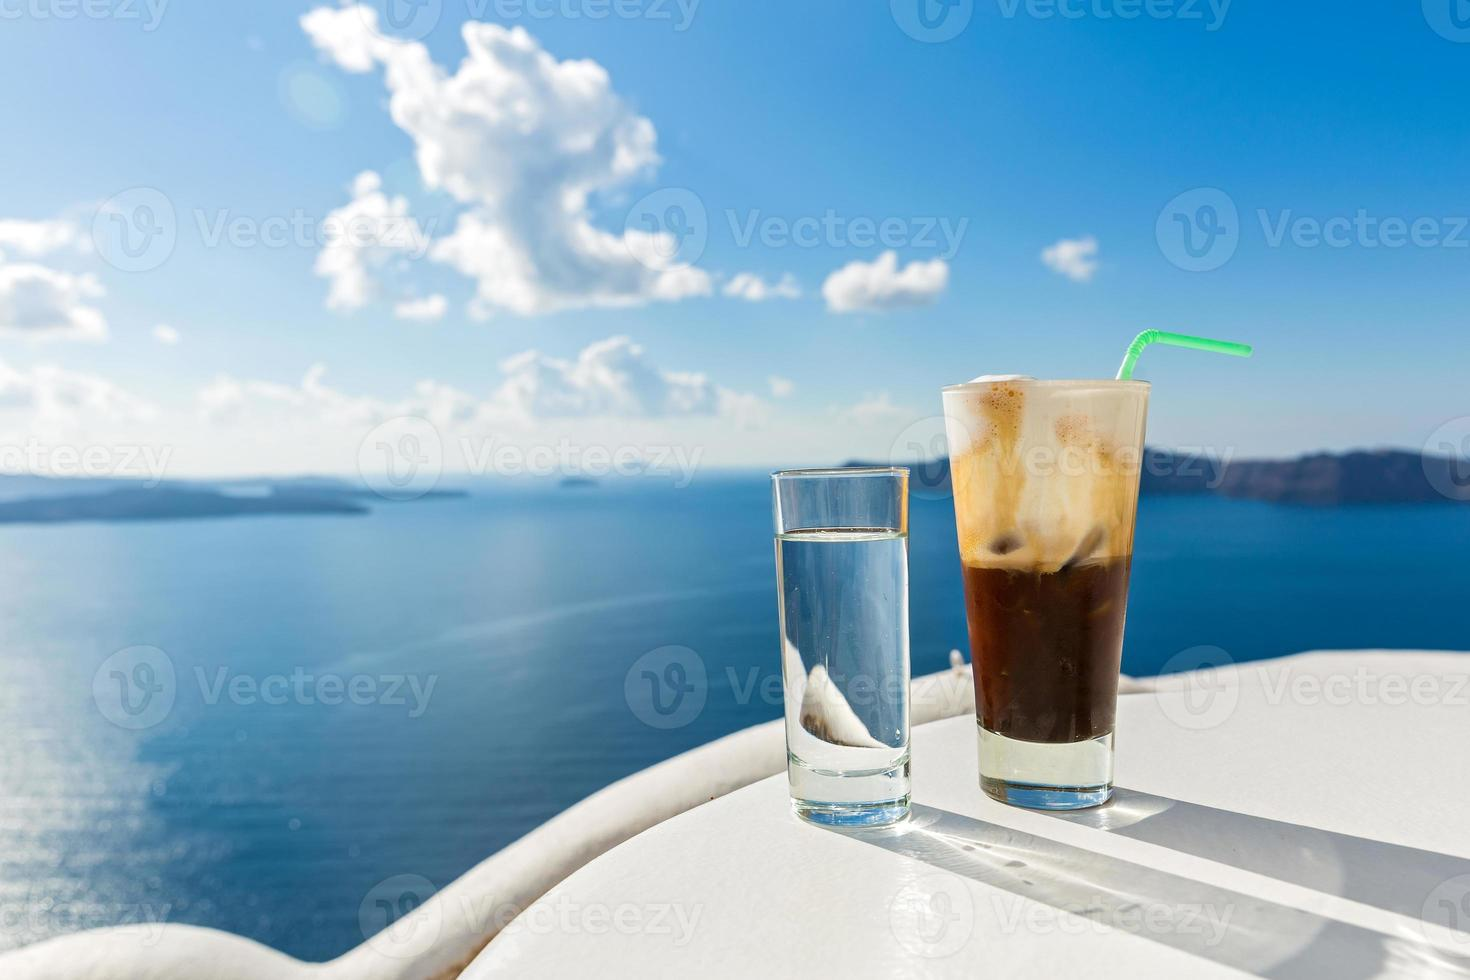 bebida refrescante perto do mar foto